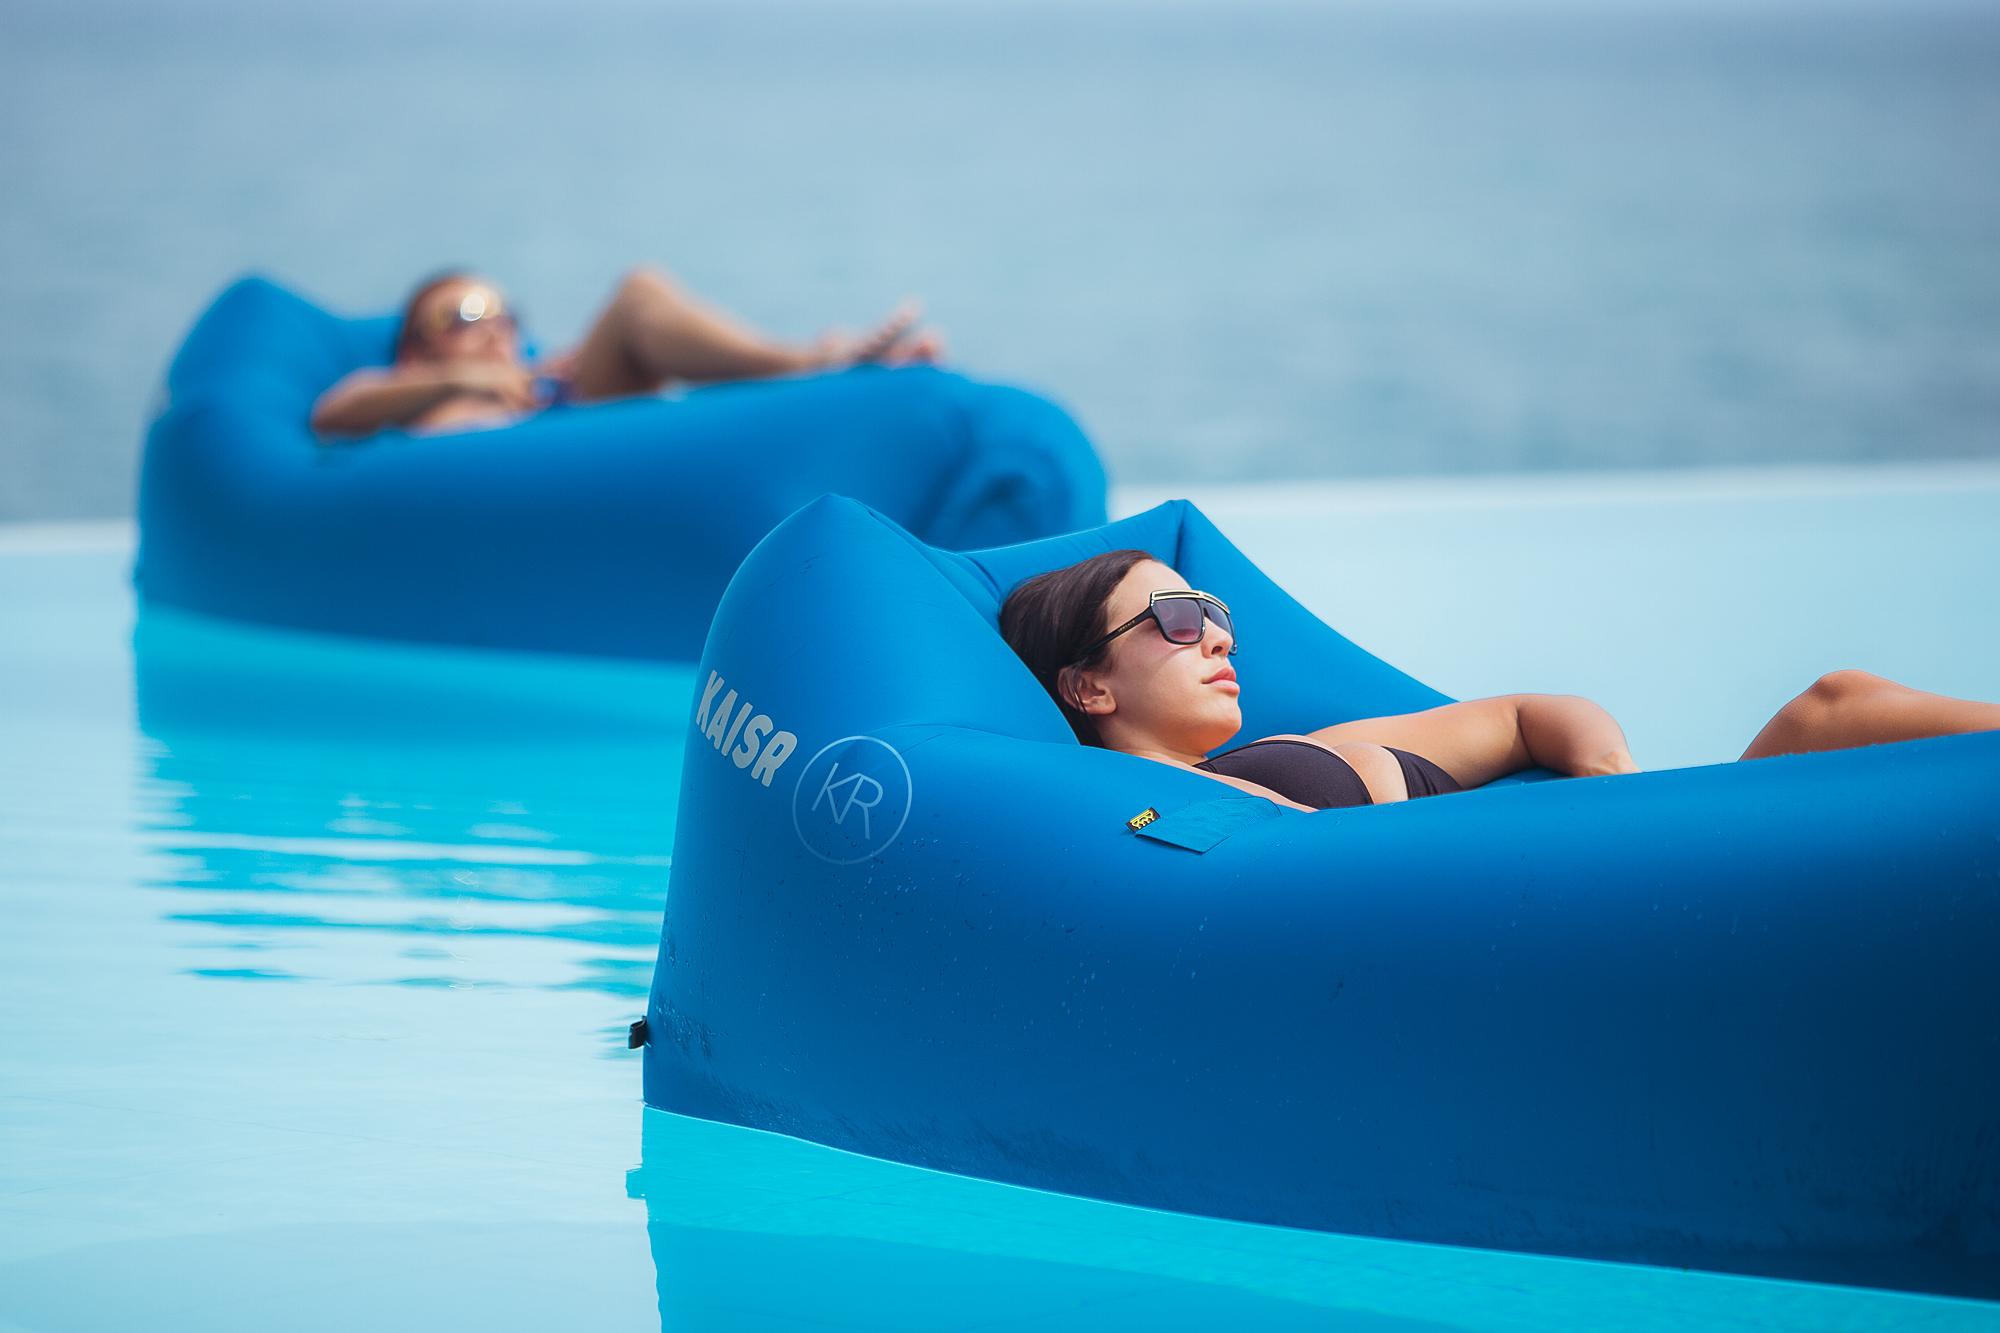 KAISR inflatable Air Lounge Featured at Kata Rocks : KR24056 from www.katarocks.com size 2000 x 1333 jpeg 1125kB